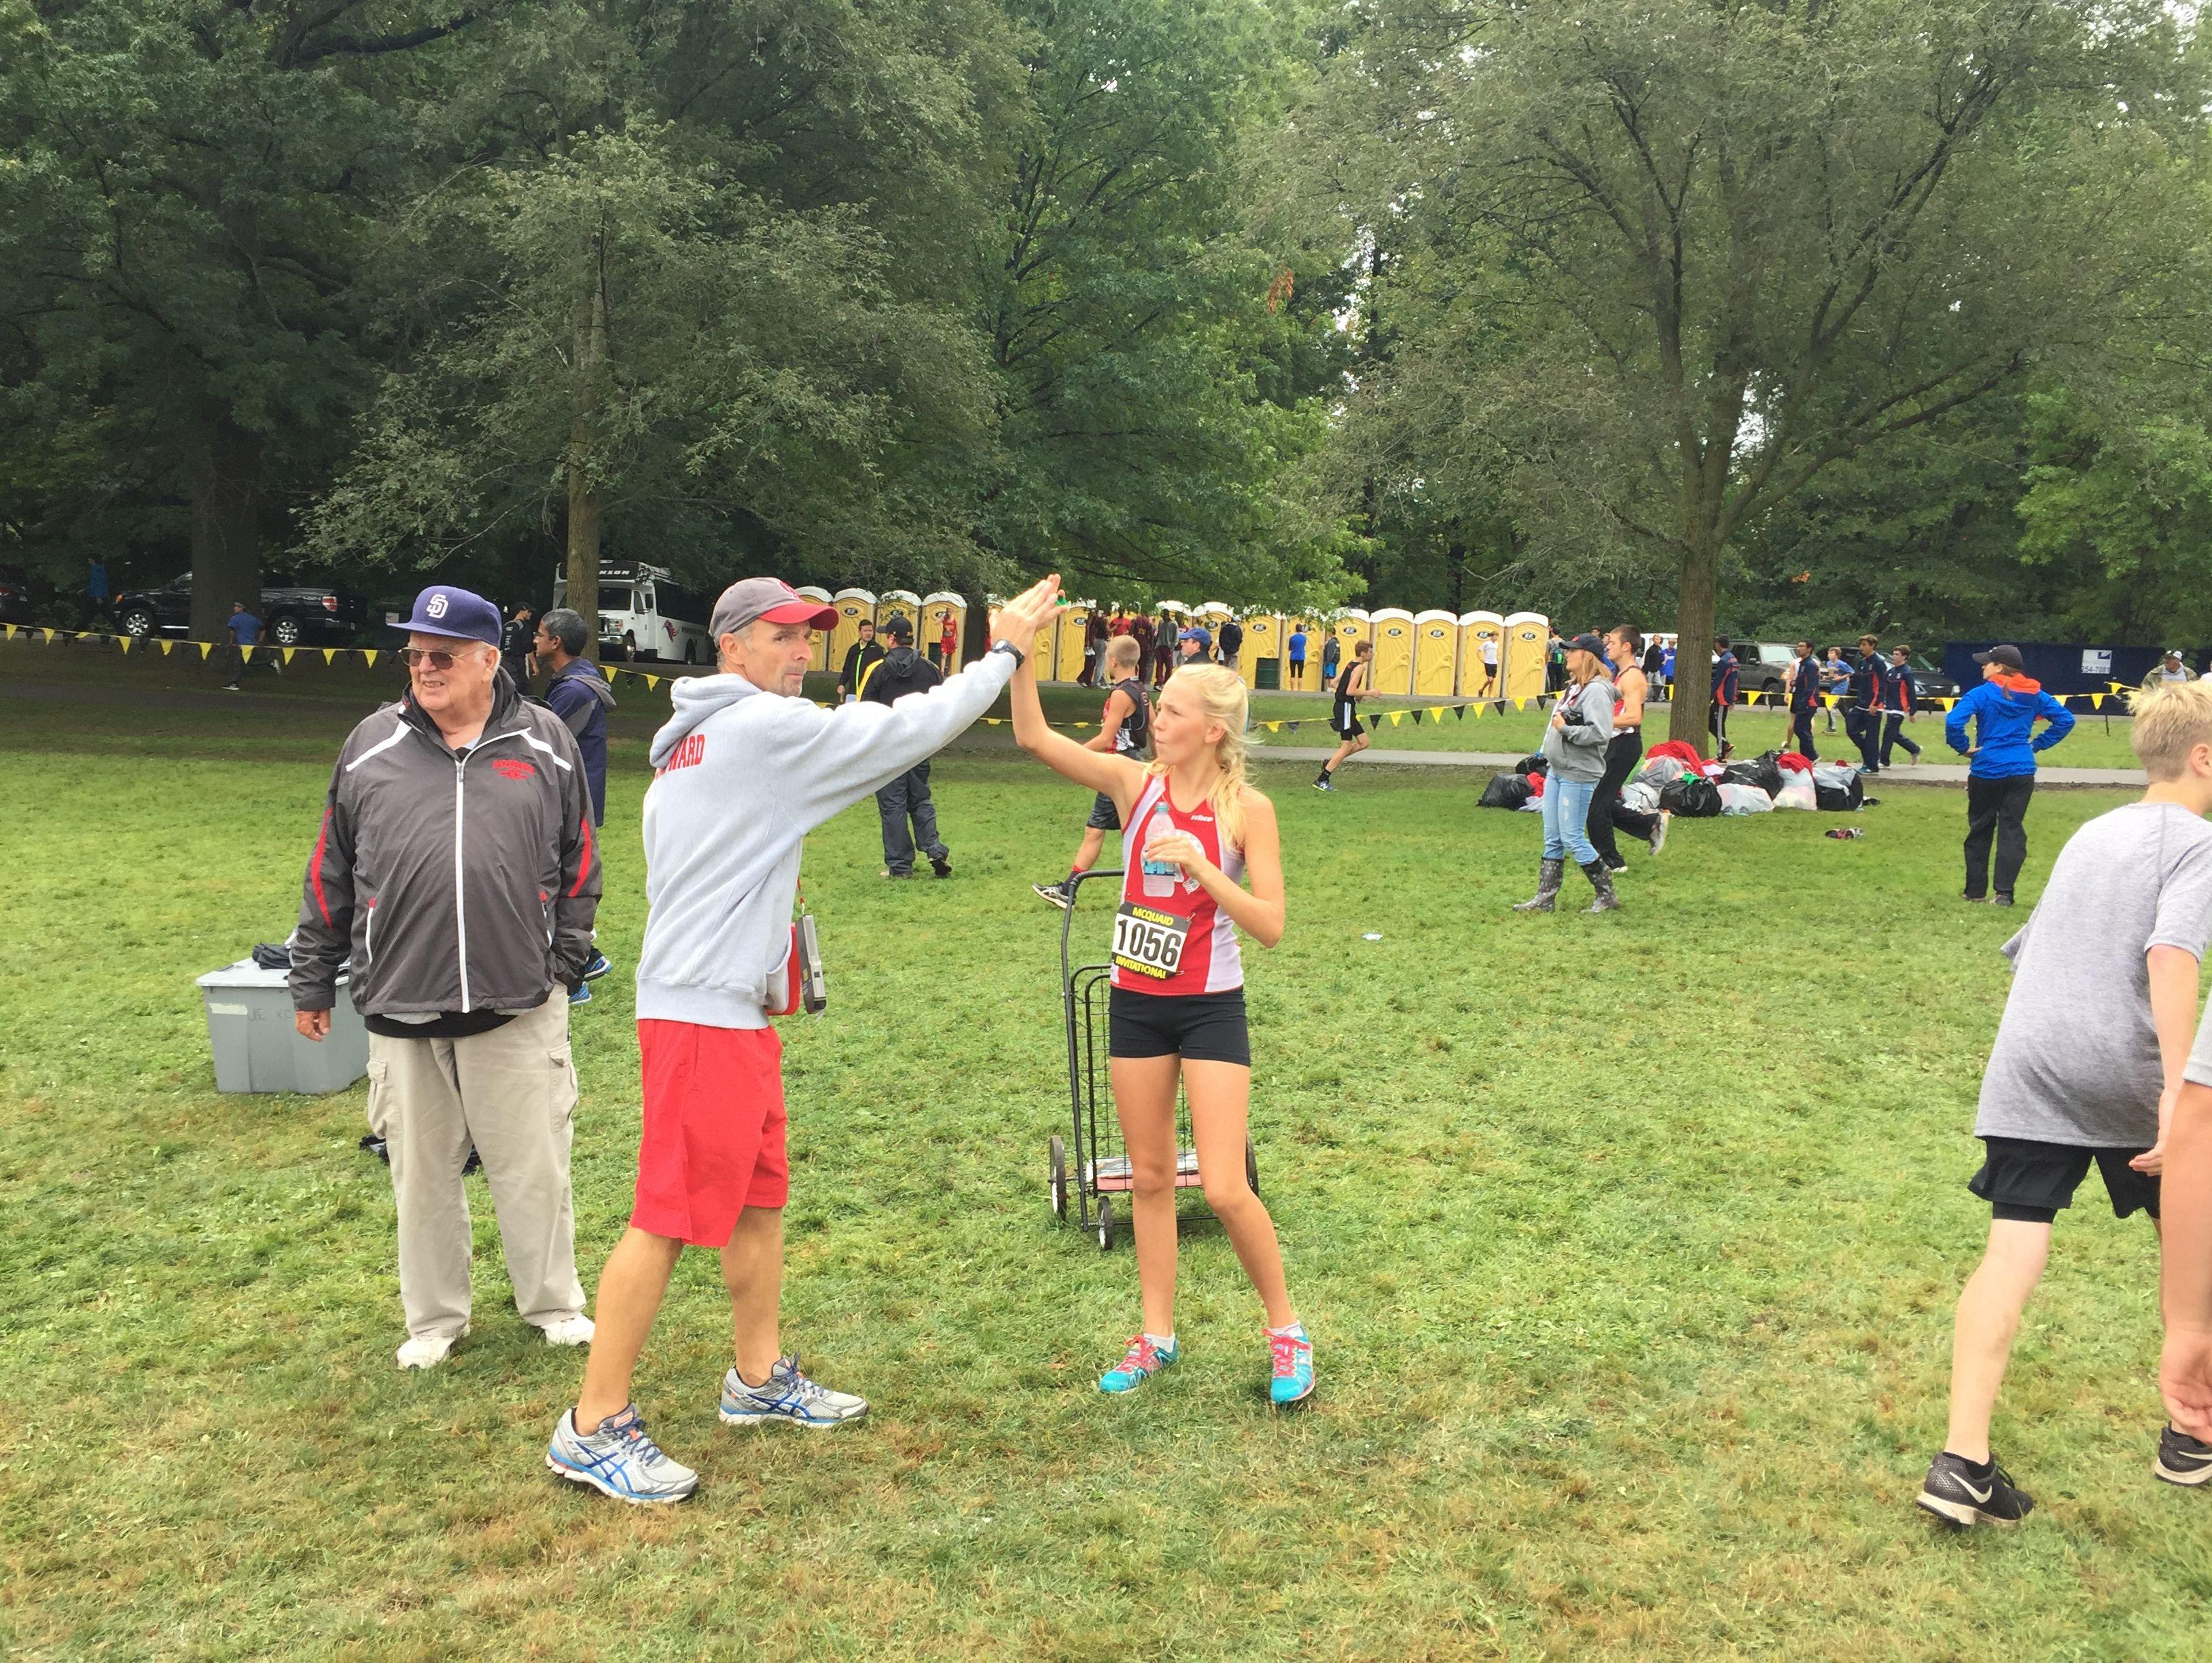 Canandaigua coach Matt Ward firing up runners before a seeded race at the 2016 McQuaid Invitational